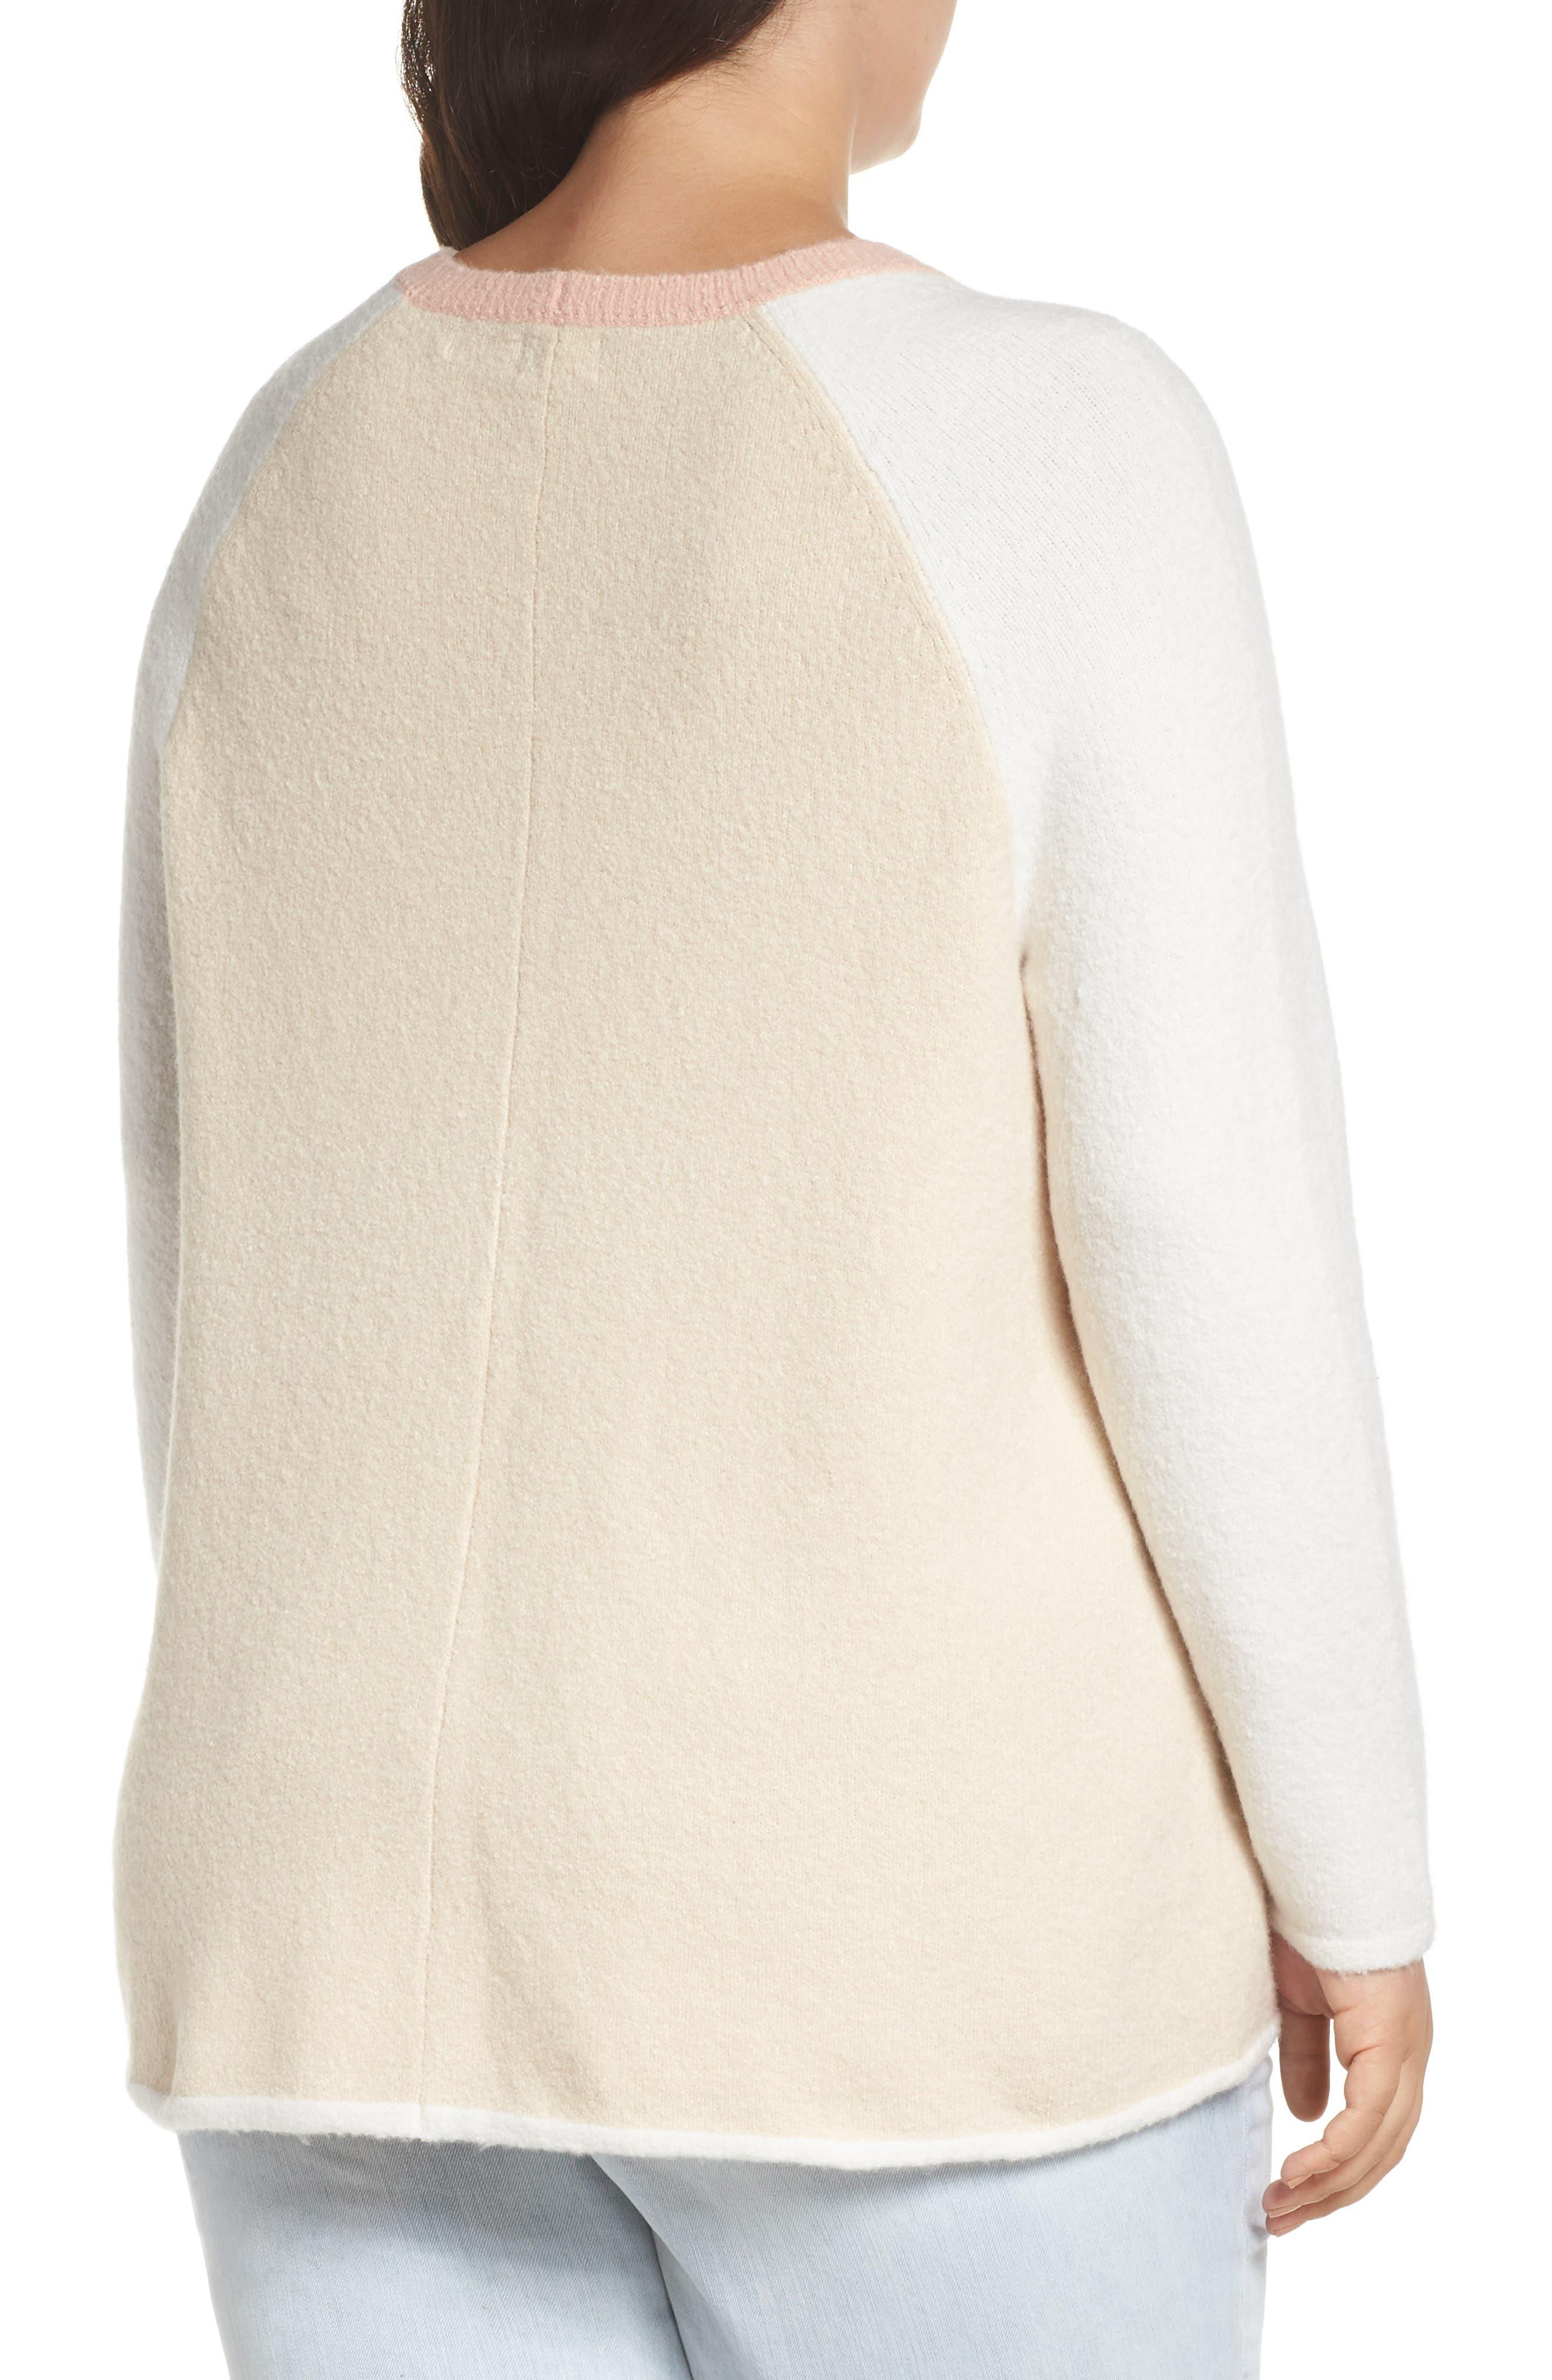 Colorblock Sweater,                             Alternate thumbnail 2, color,                             GREY LT HEATHER CB